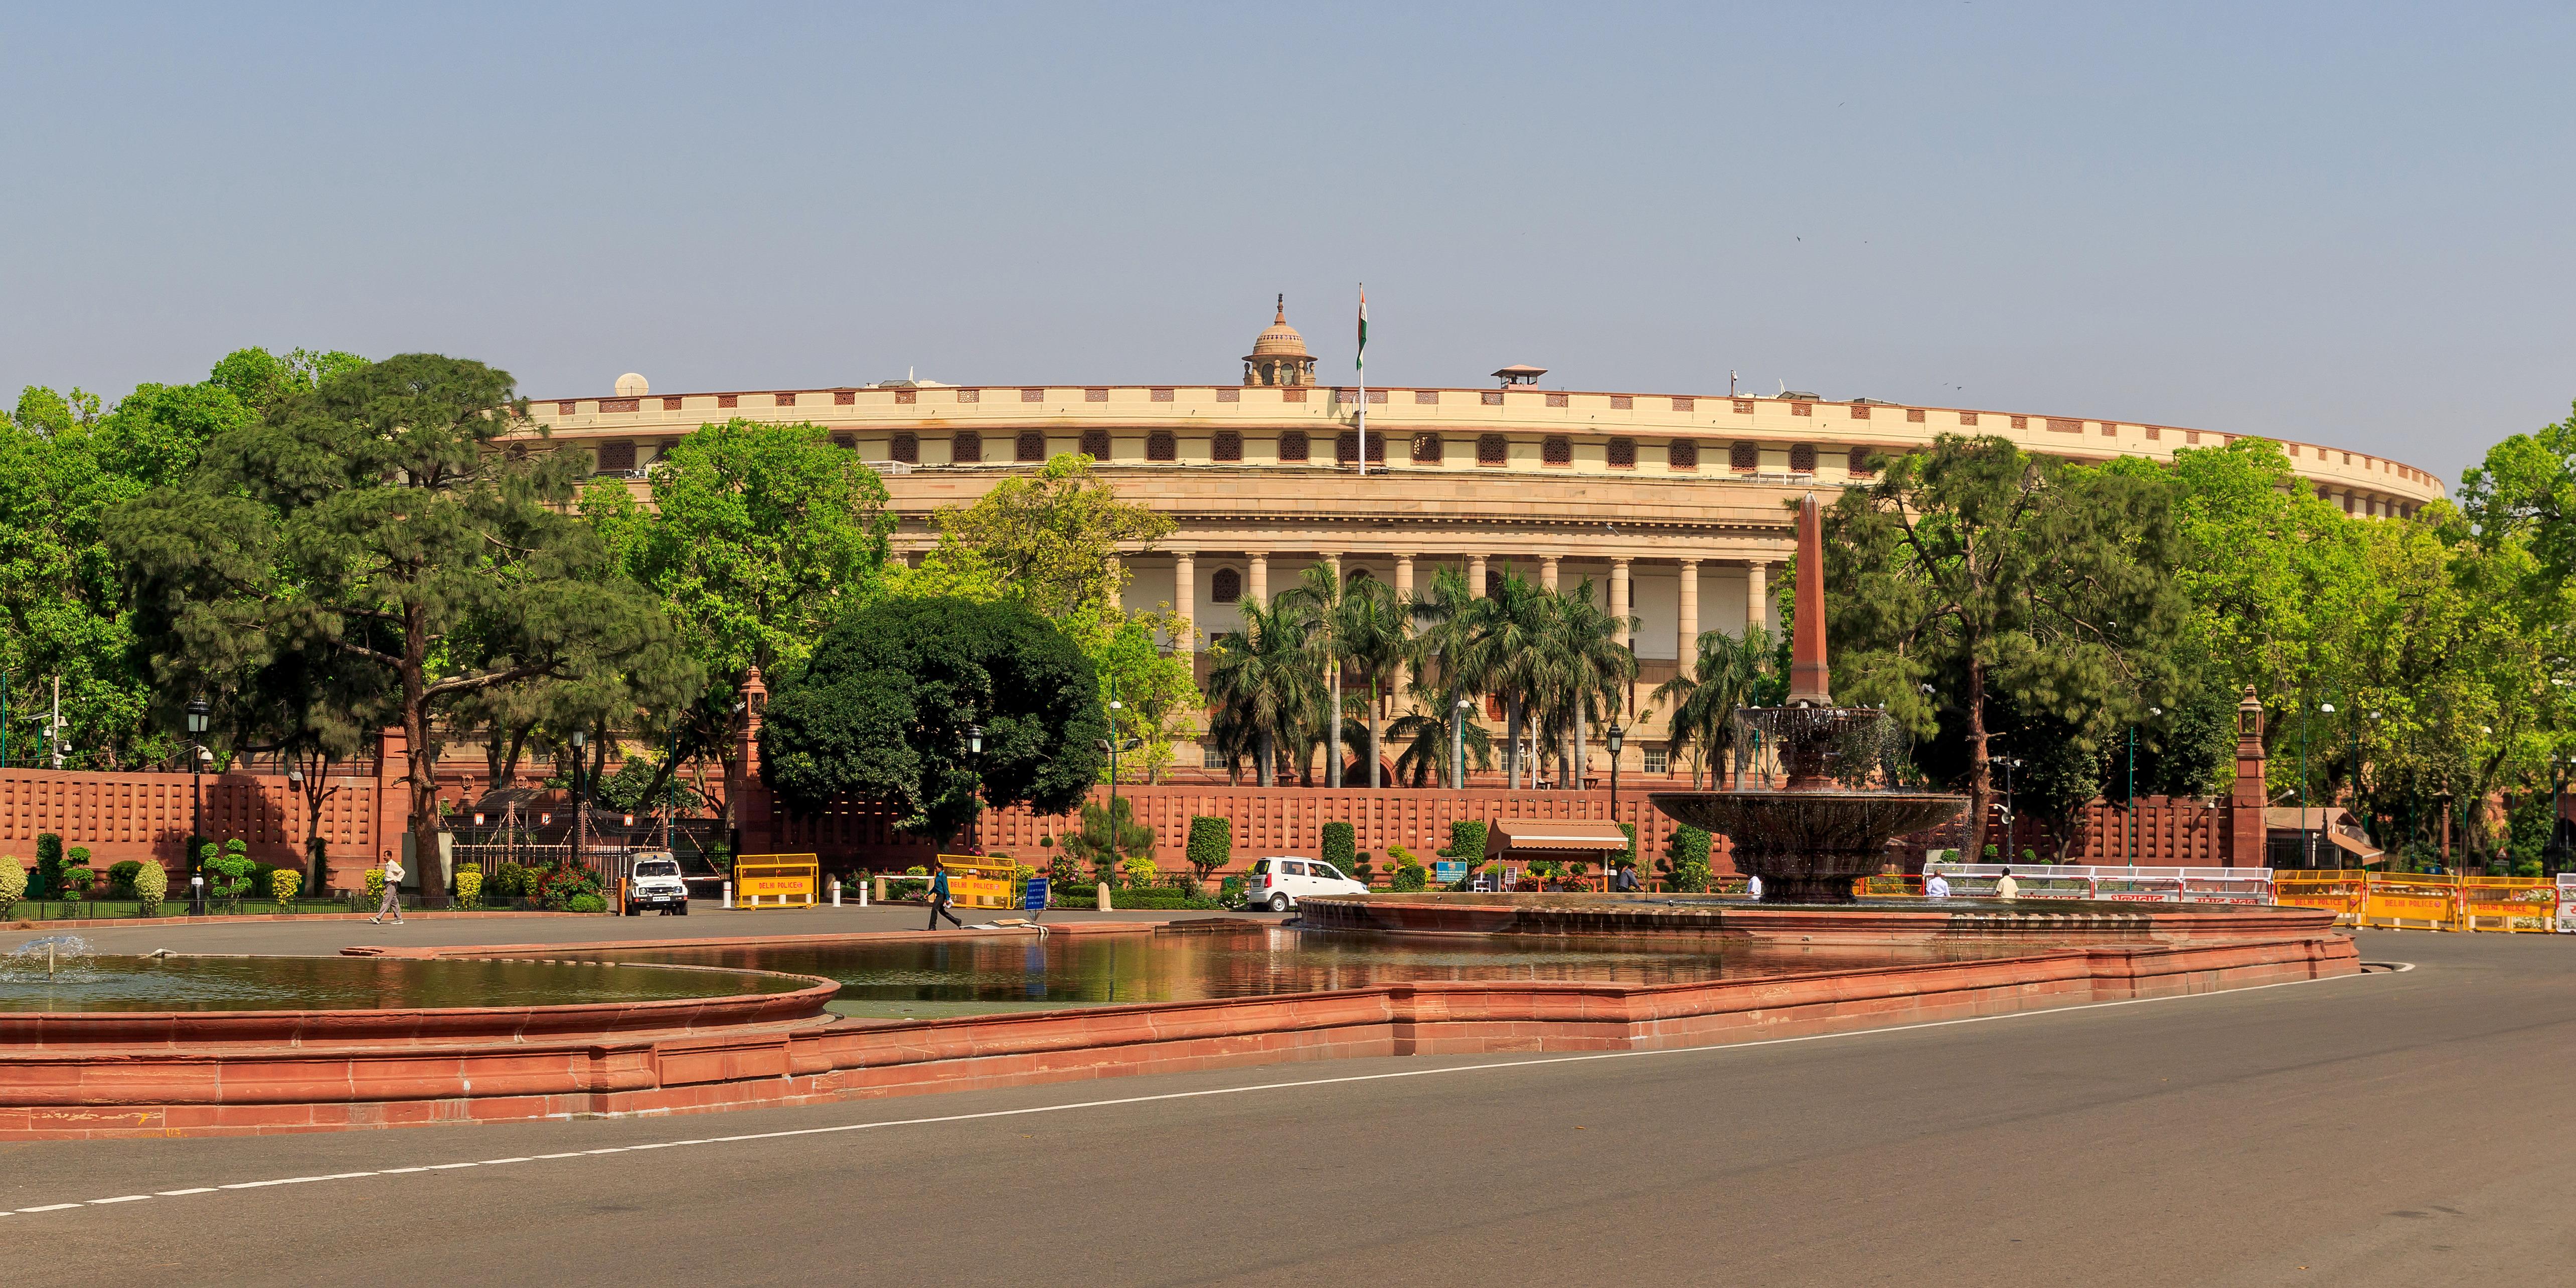 1587205336_new_delhi_government_block_03-2016_img3.jpg